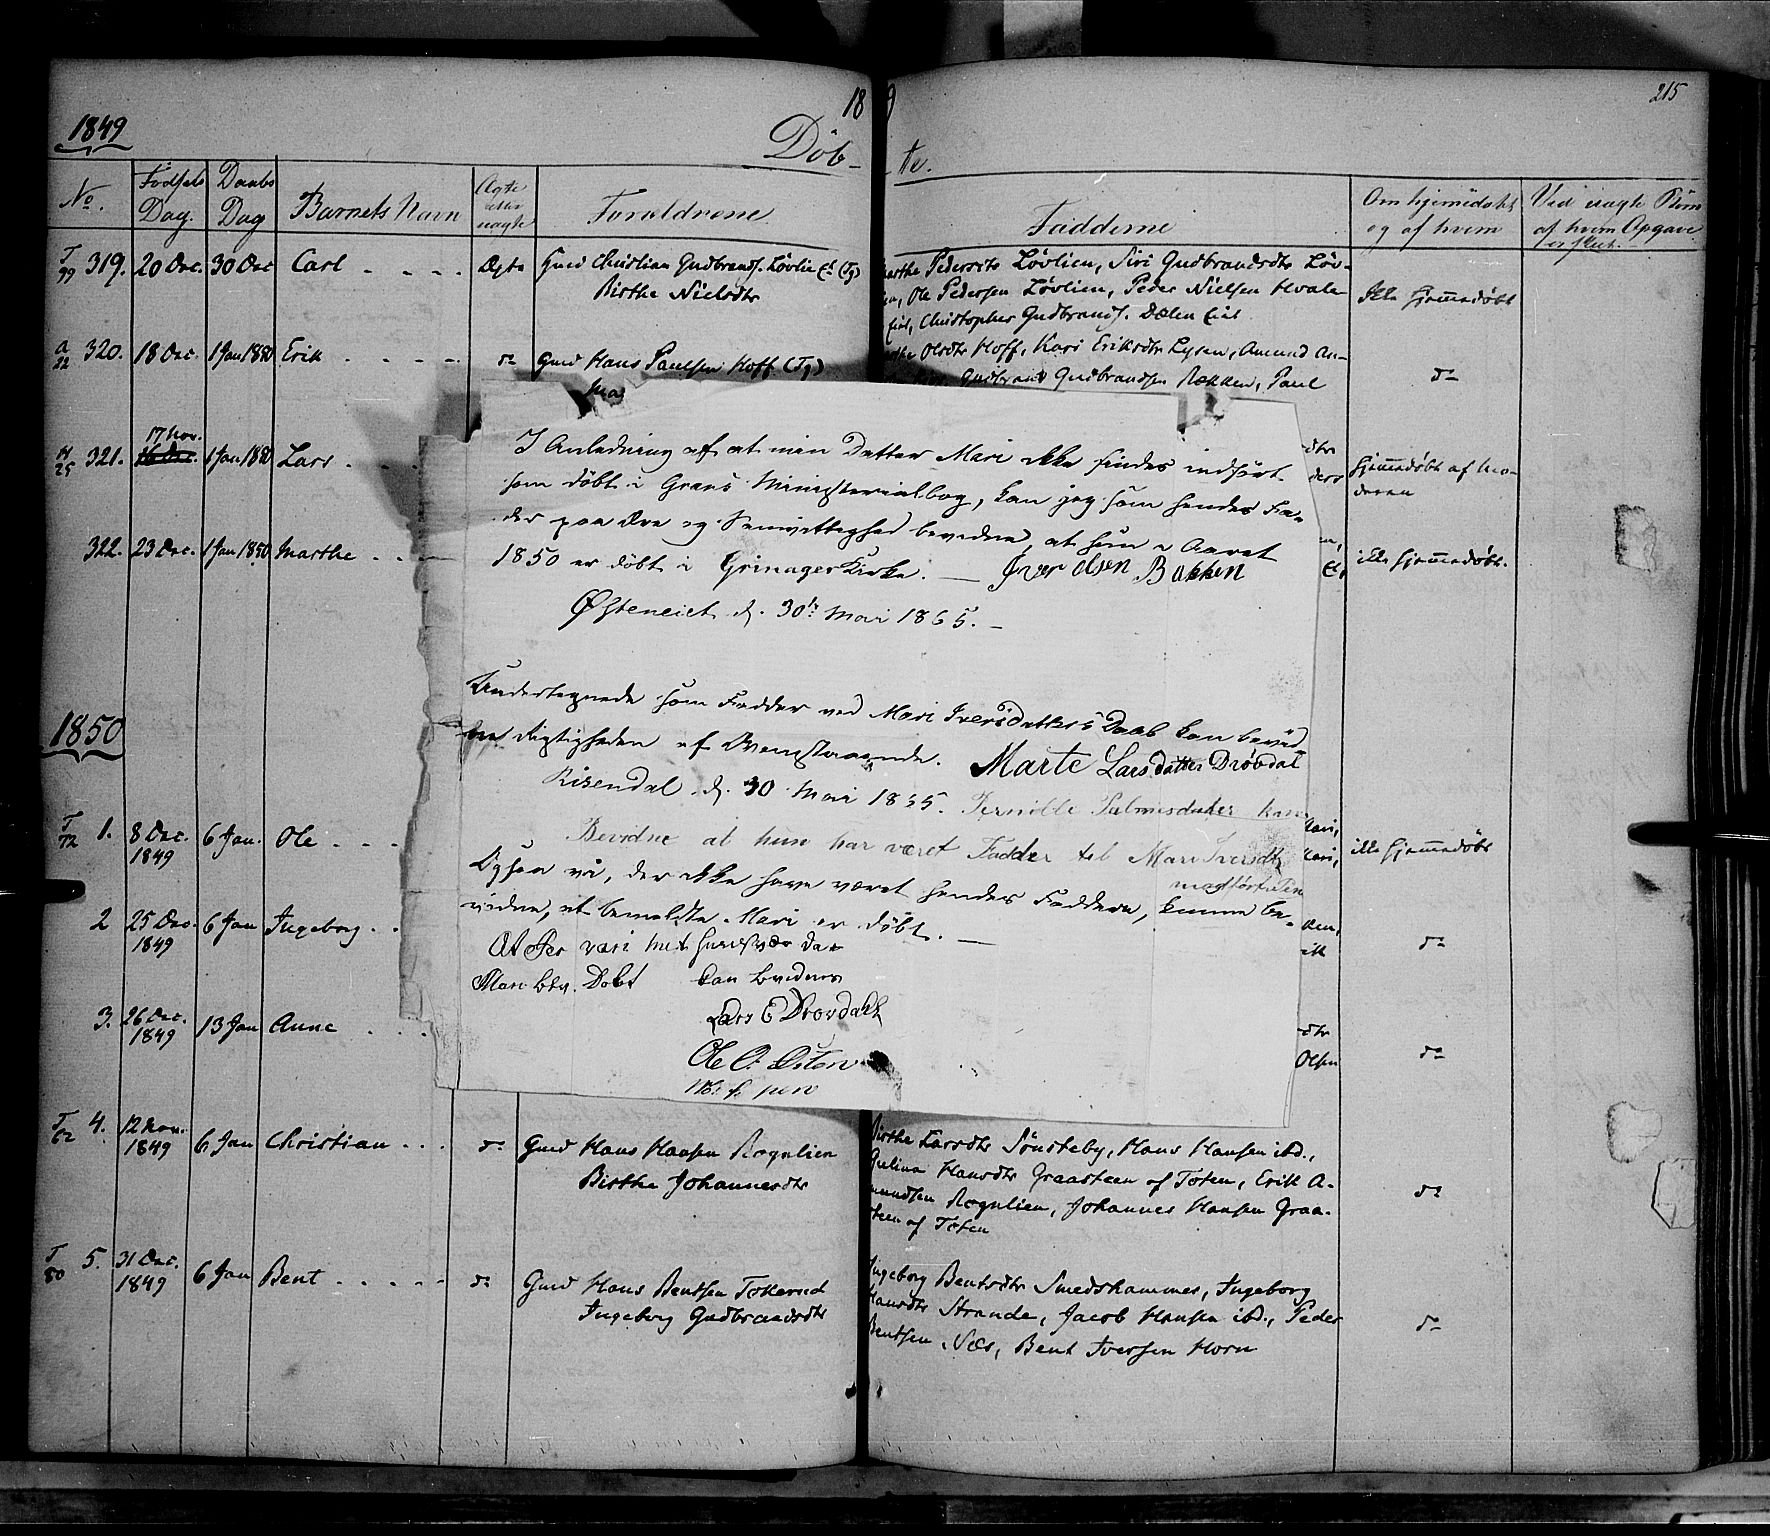 SAH, Gran prestekontor, Ministerialbok nr. 11, 1842-1856, s. 214-215